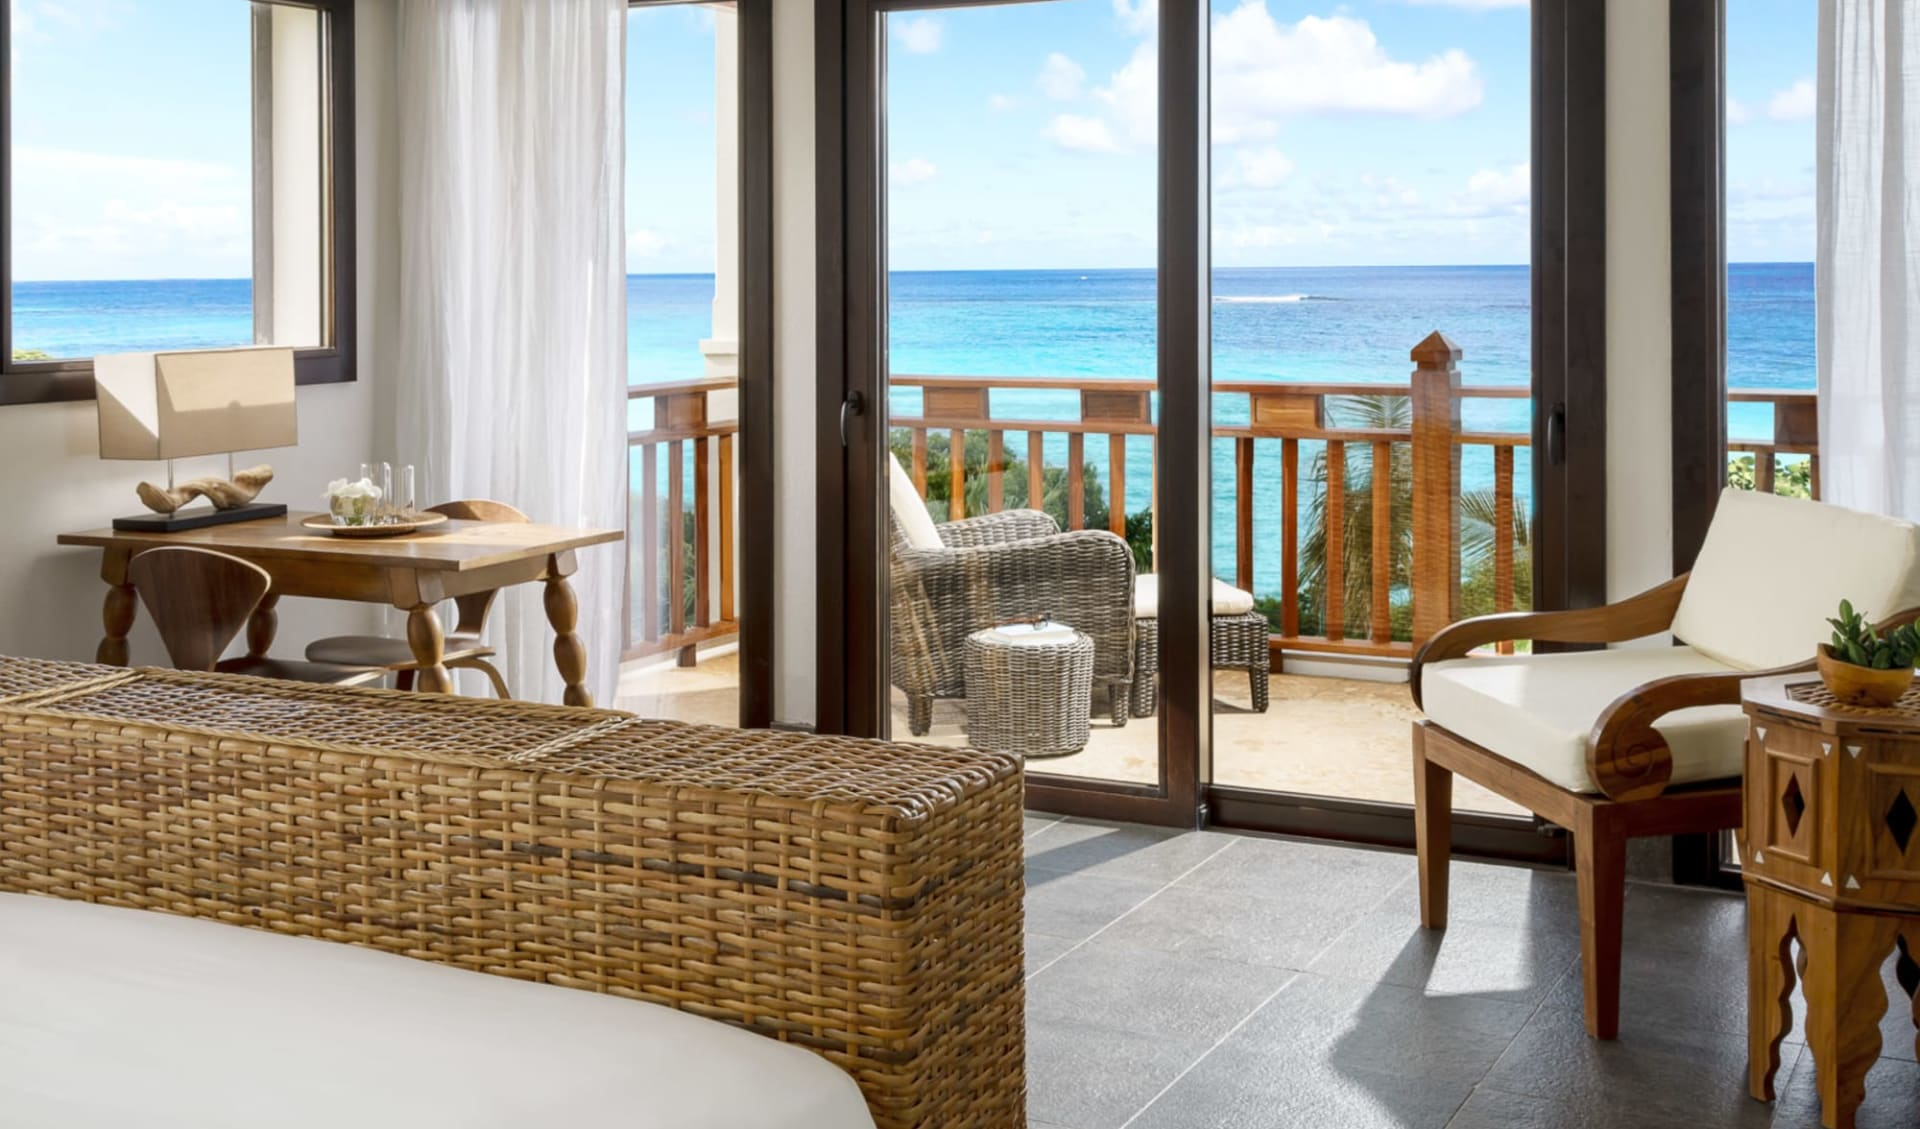 Zemi Beach House in Shoal Bay East:  Zimmer Zemi Beach House Anguilla - Zimmer mit Balkon cHotel